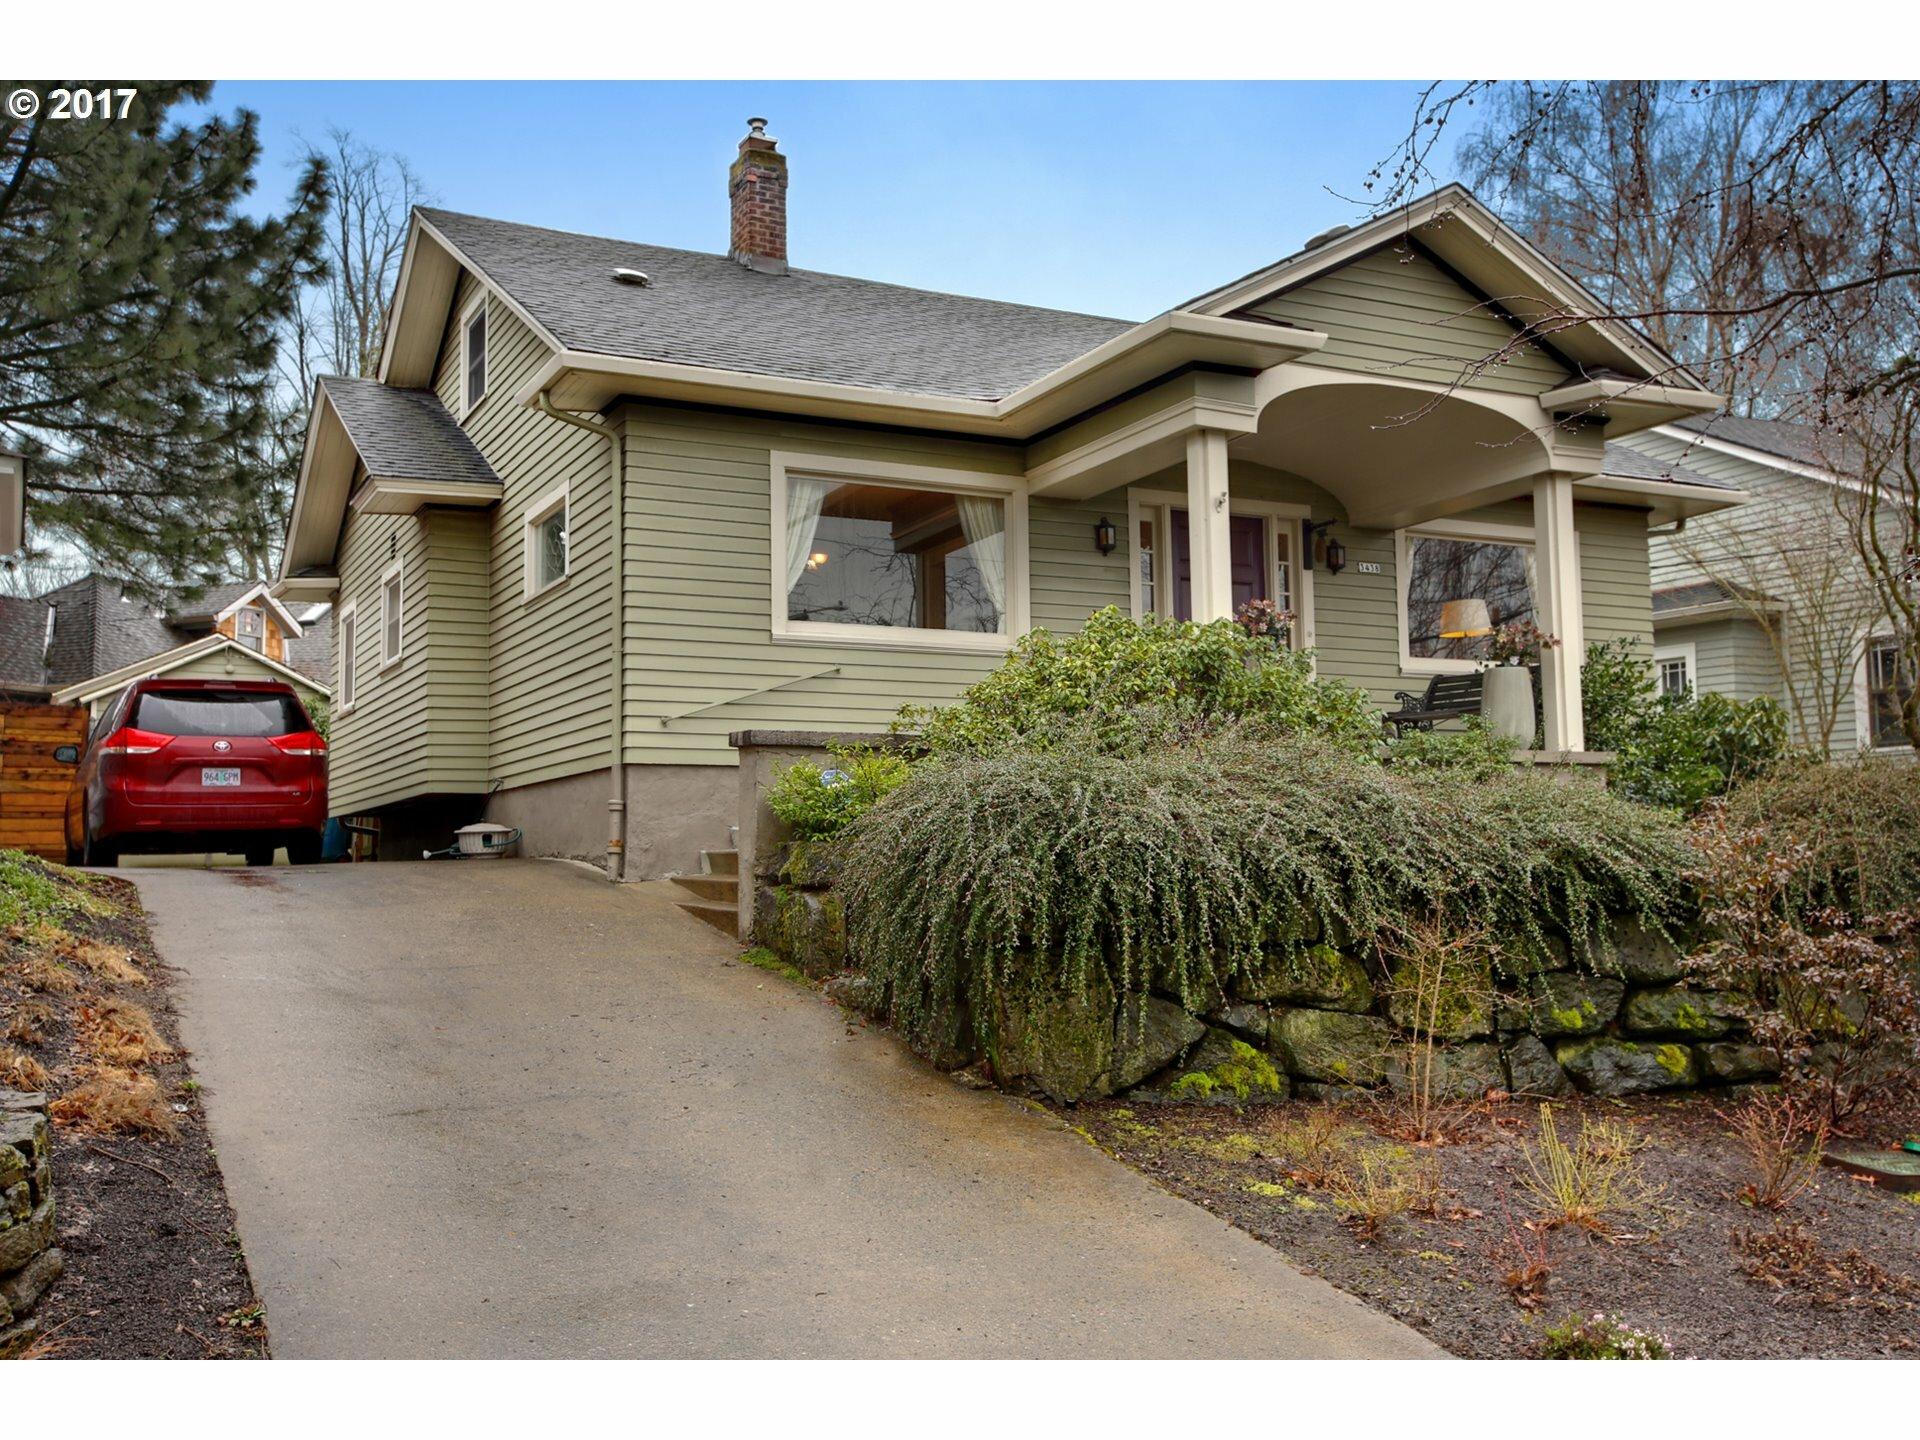 3438 Ne Hassalo St, Portland, OR - USA (photo 1)